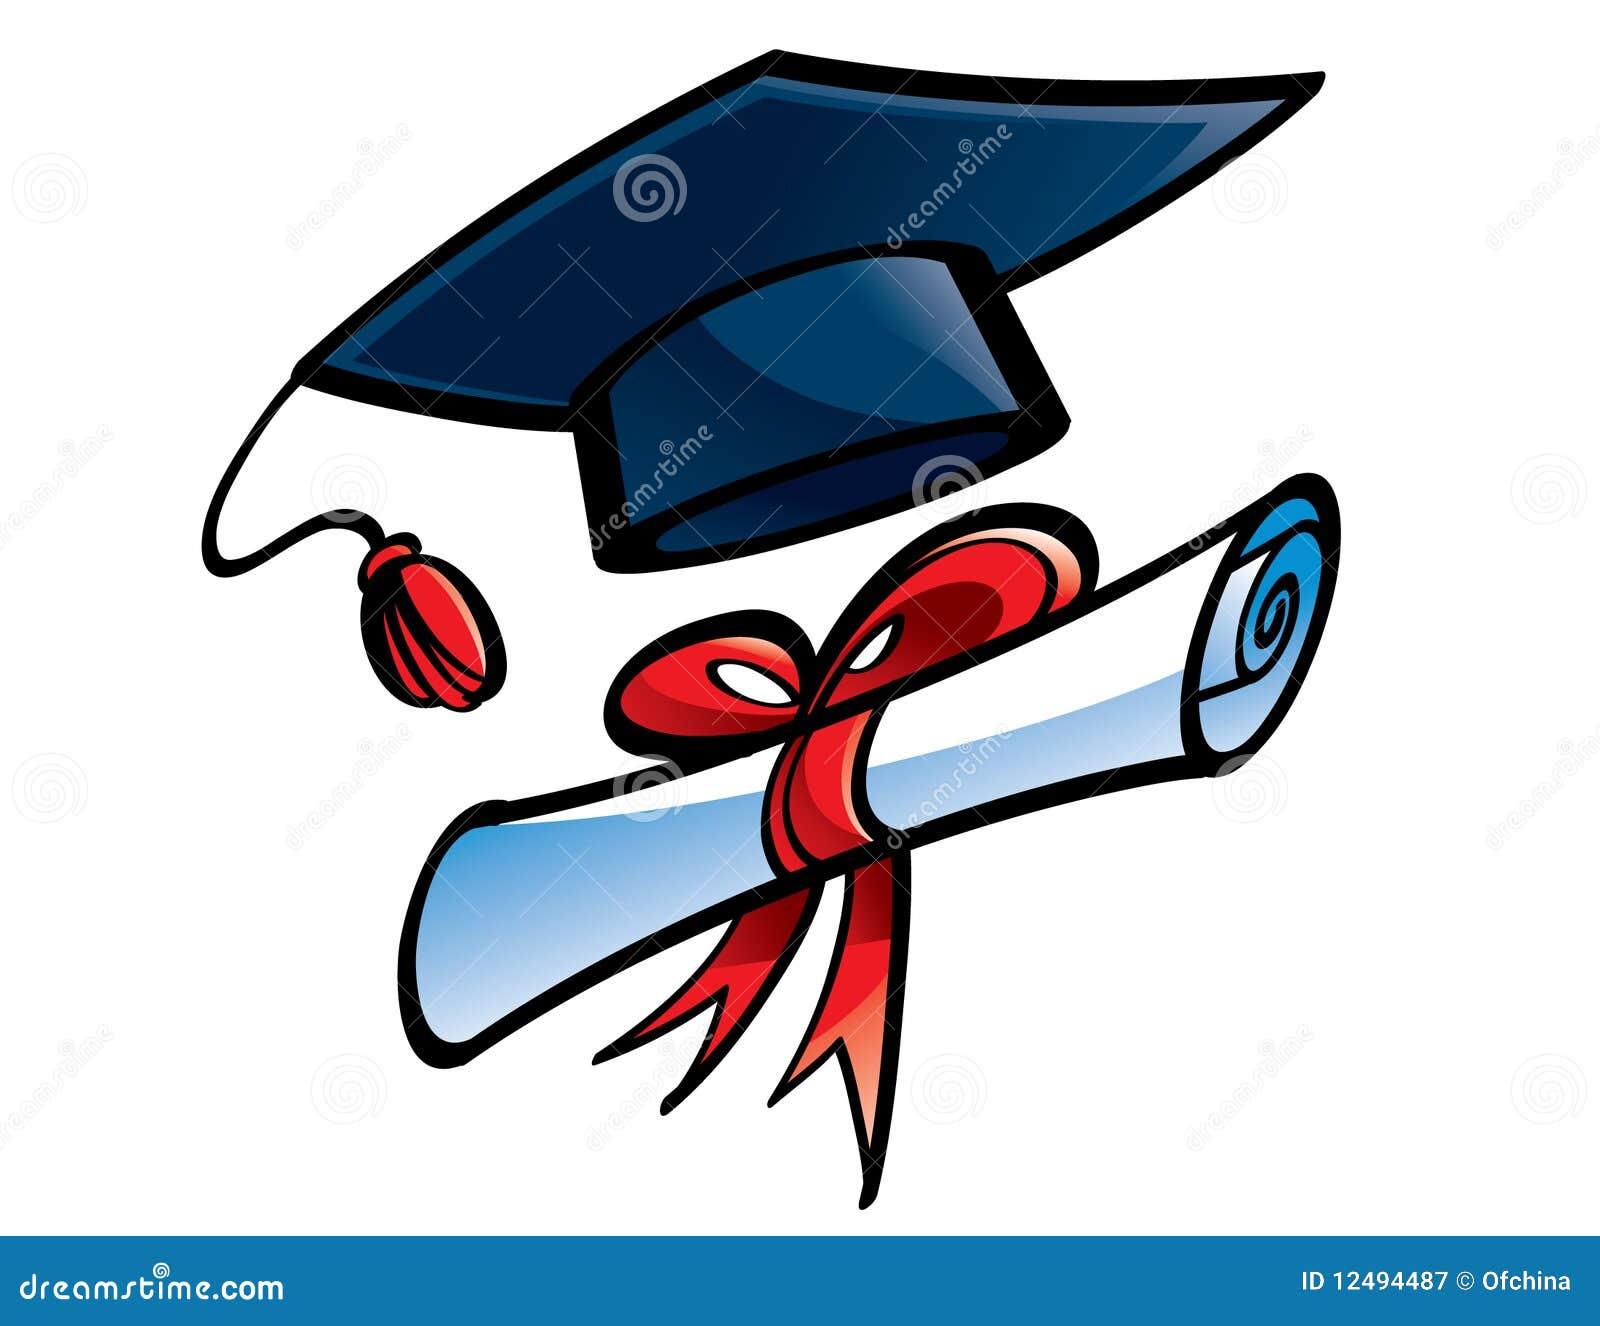 Education Graduation Cap And Diploma